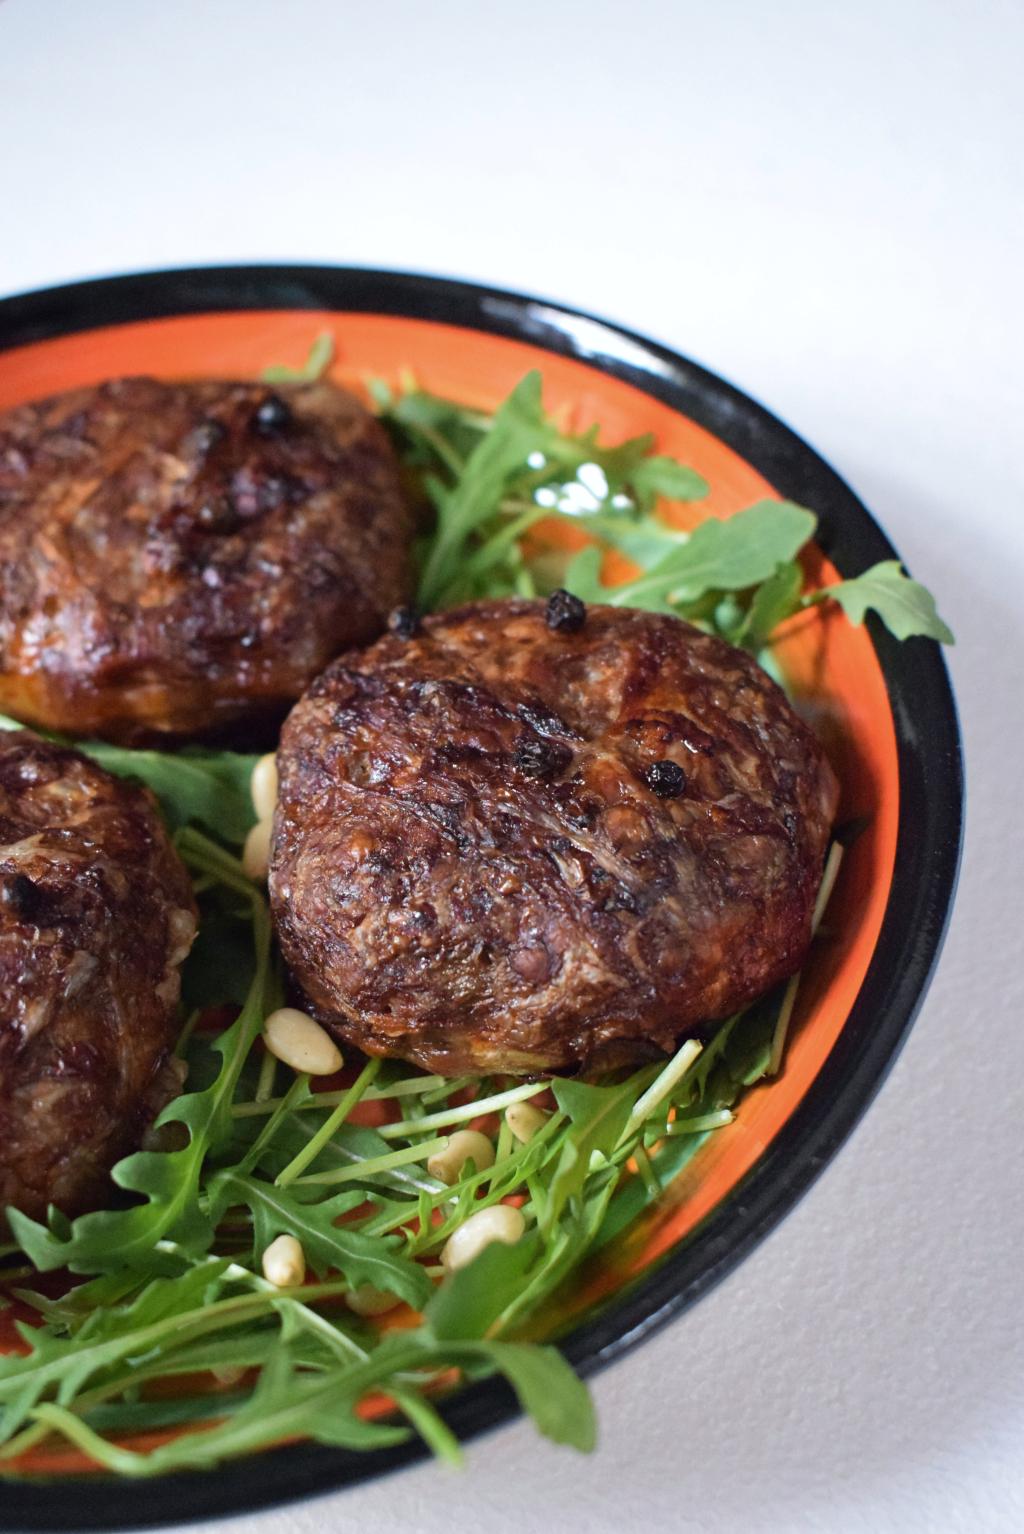 isicia omentata roman burger